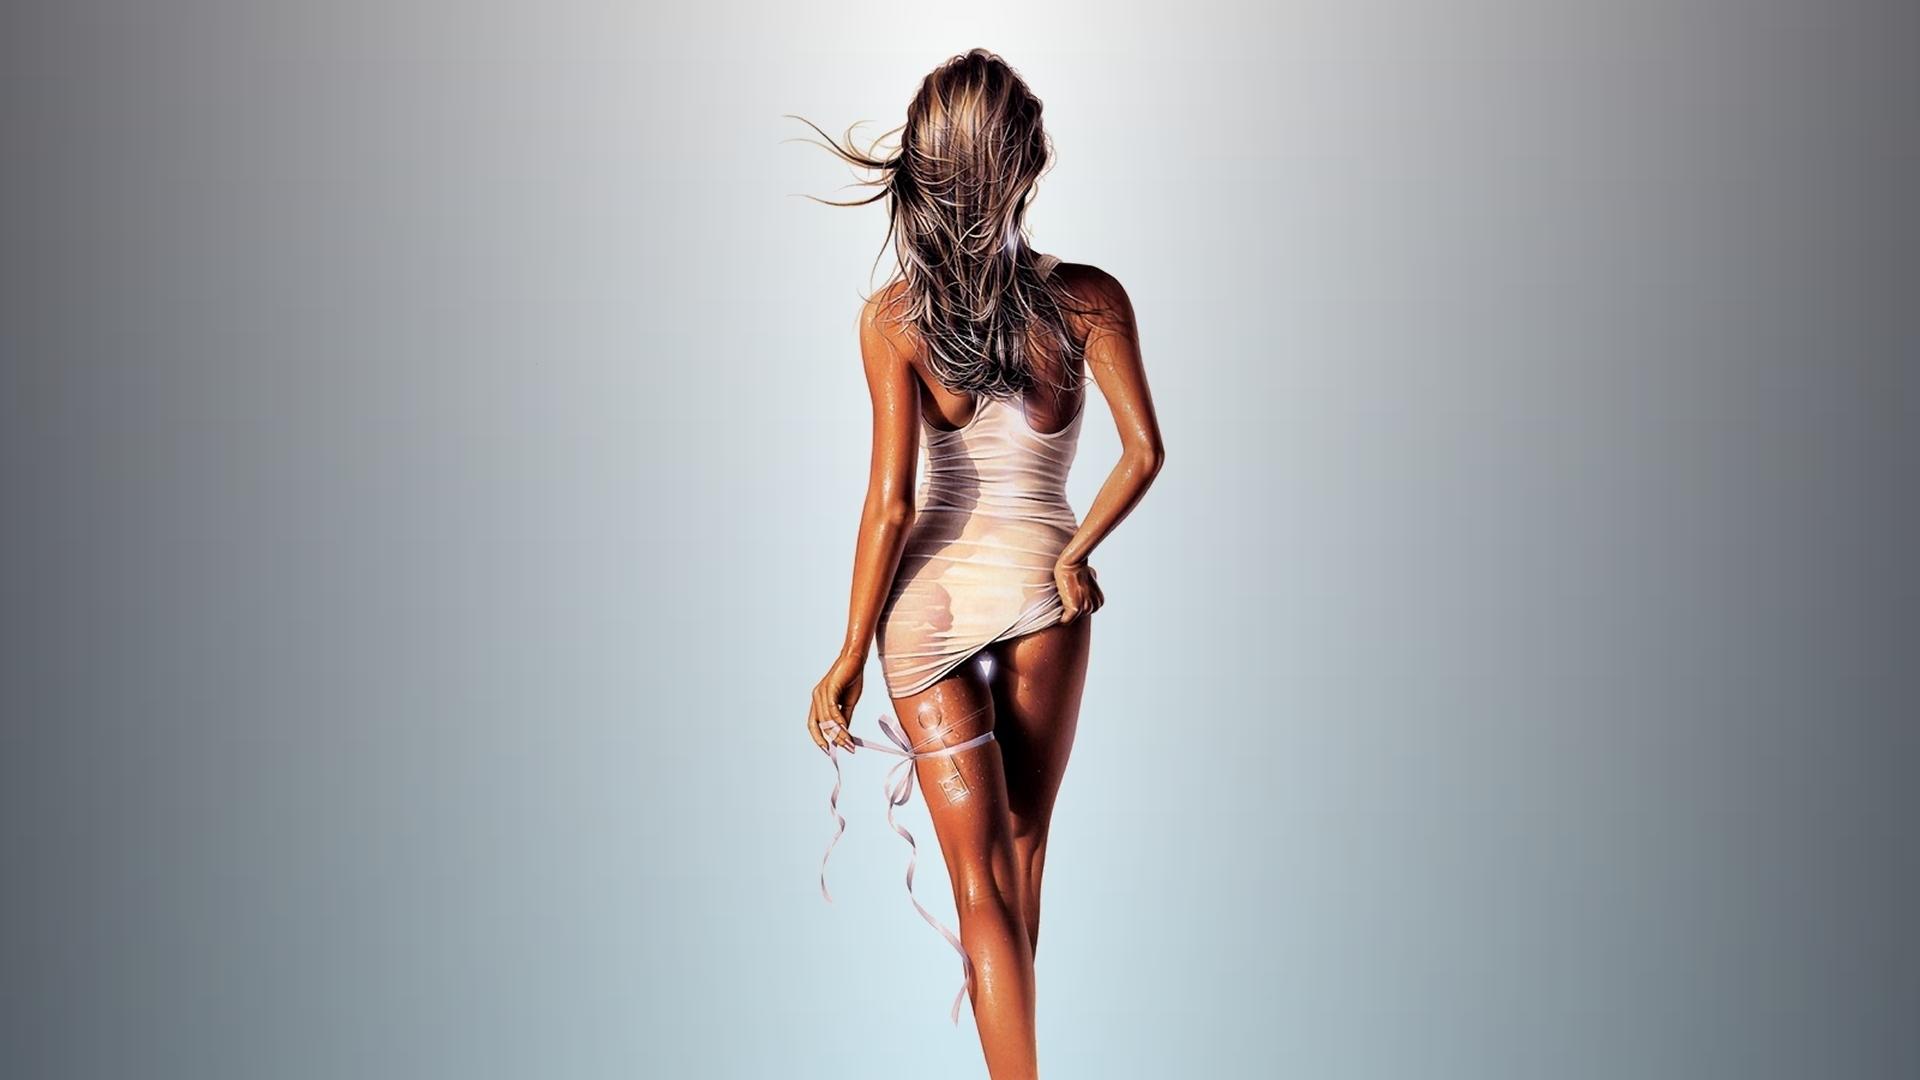 Фигура девушки с зади 18 фотография